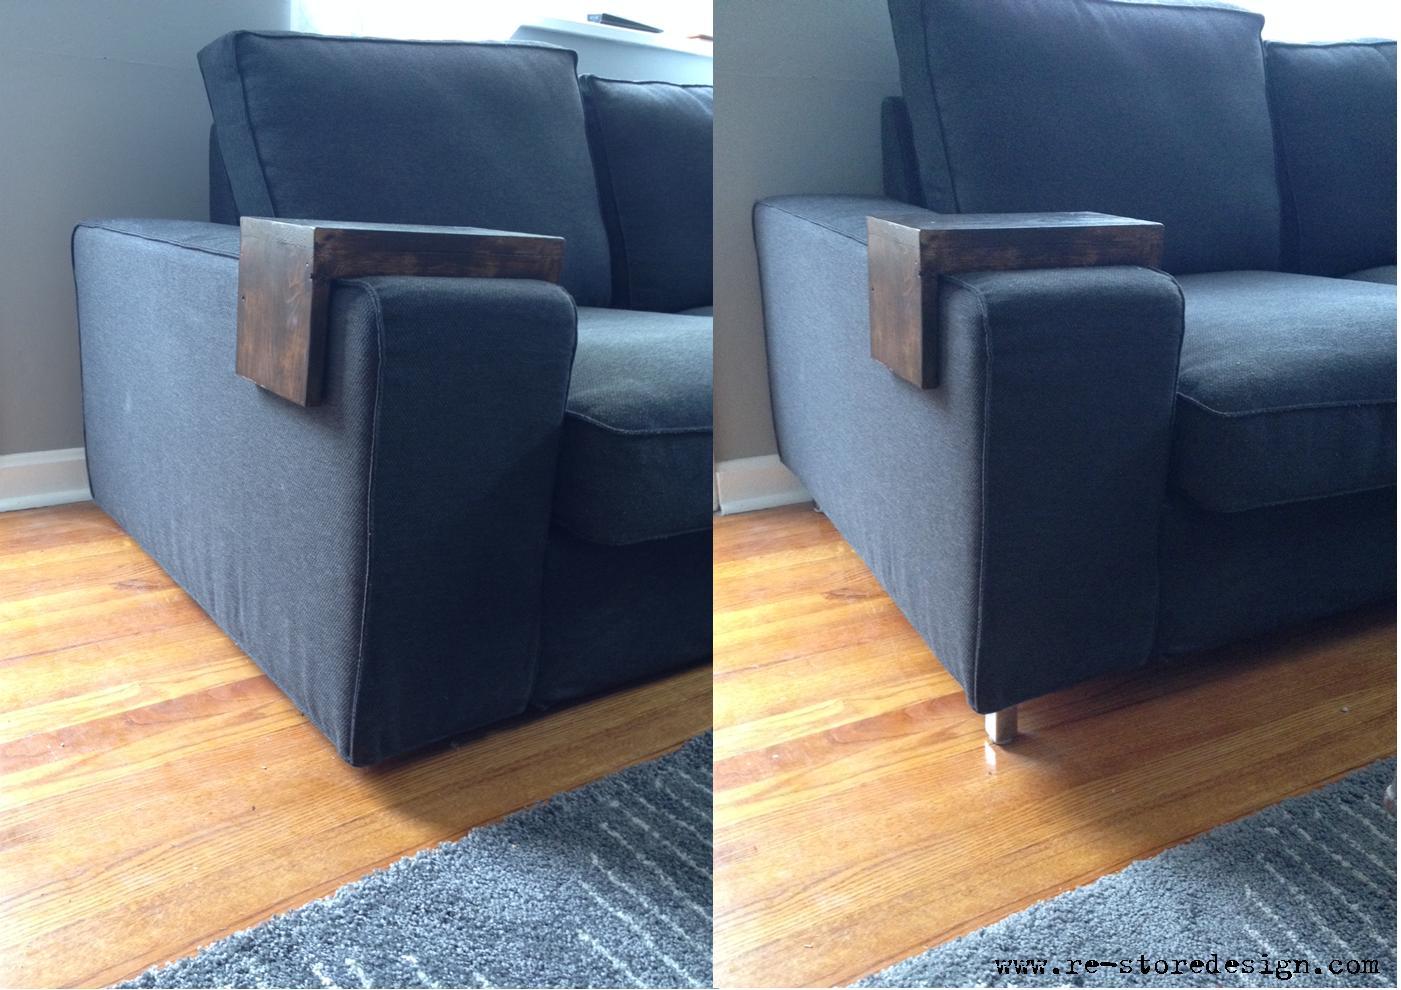 IKEA Kivik Couch Update Behind The Scenes Of KA Design